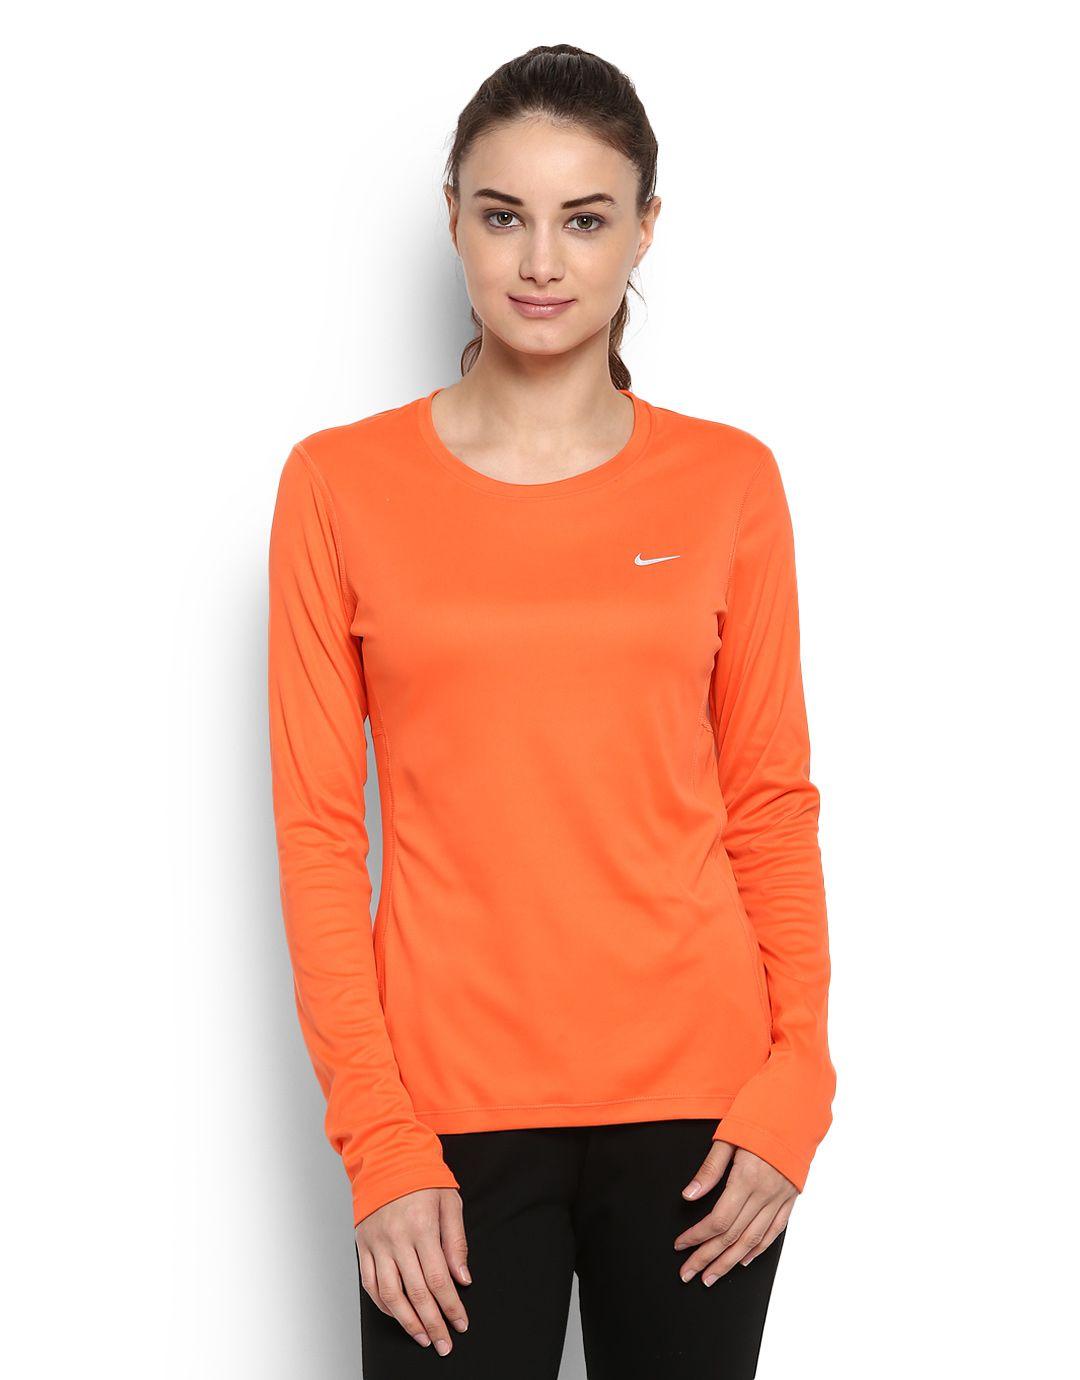 Nike Orange Tops